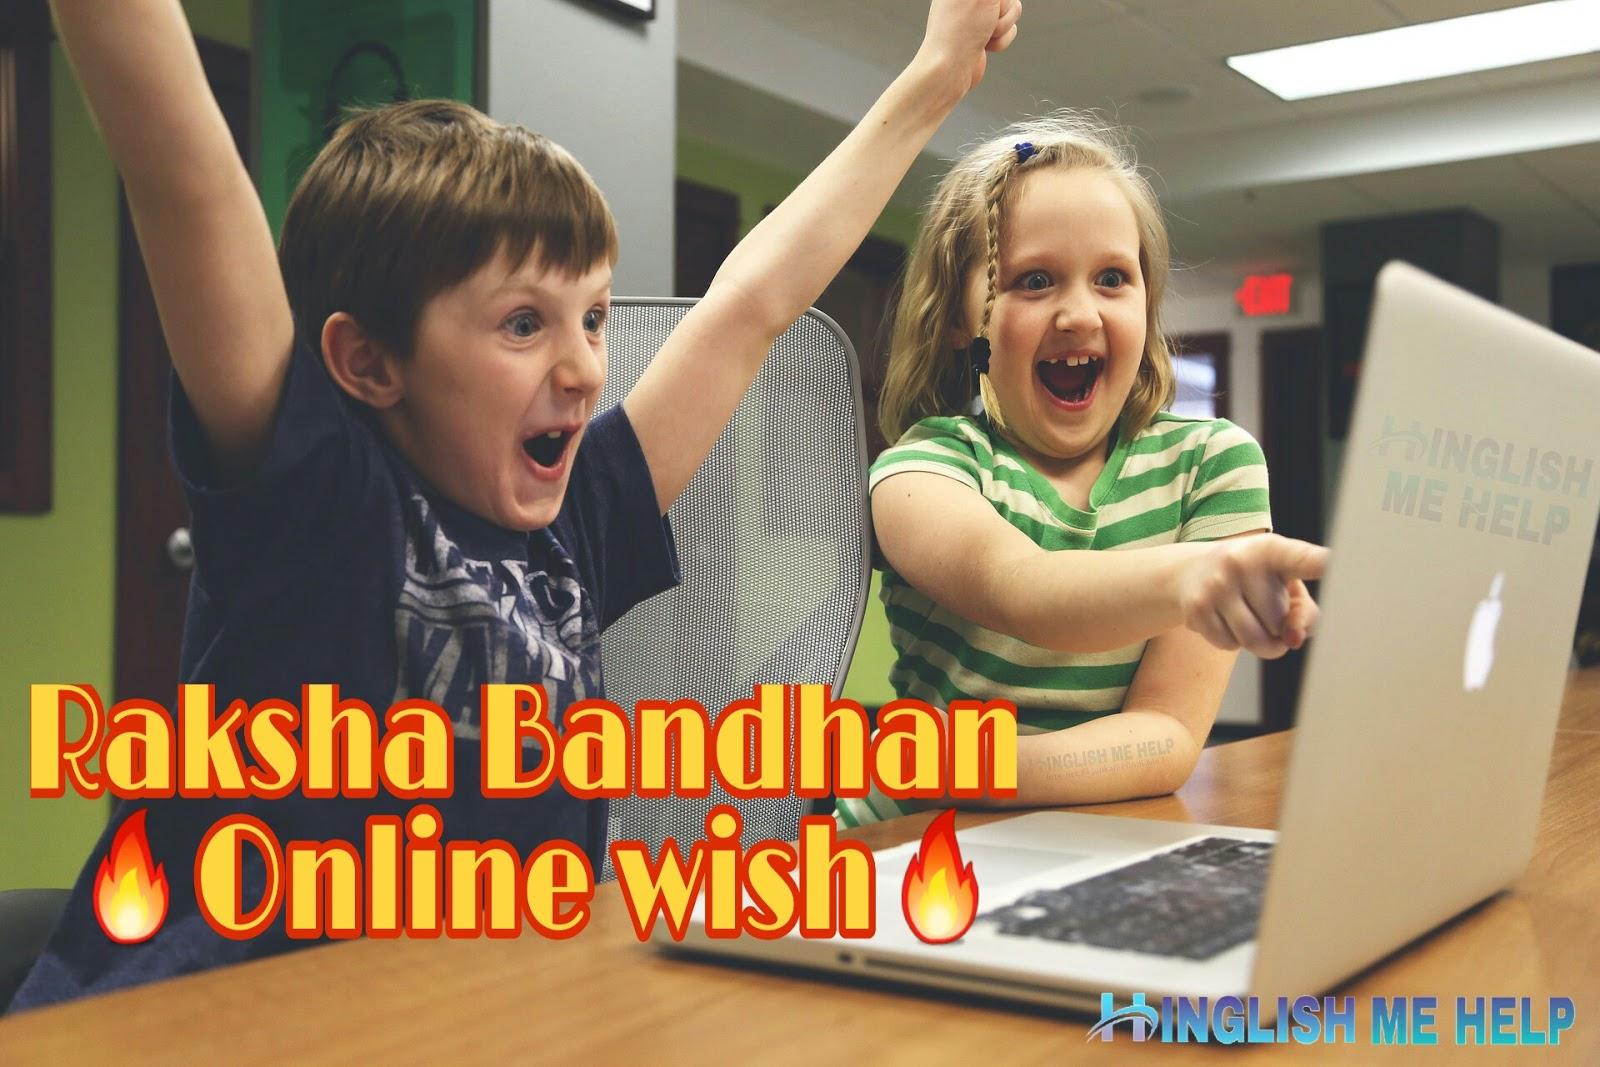 Raksha bandhan festival wishing script